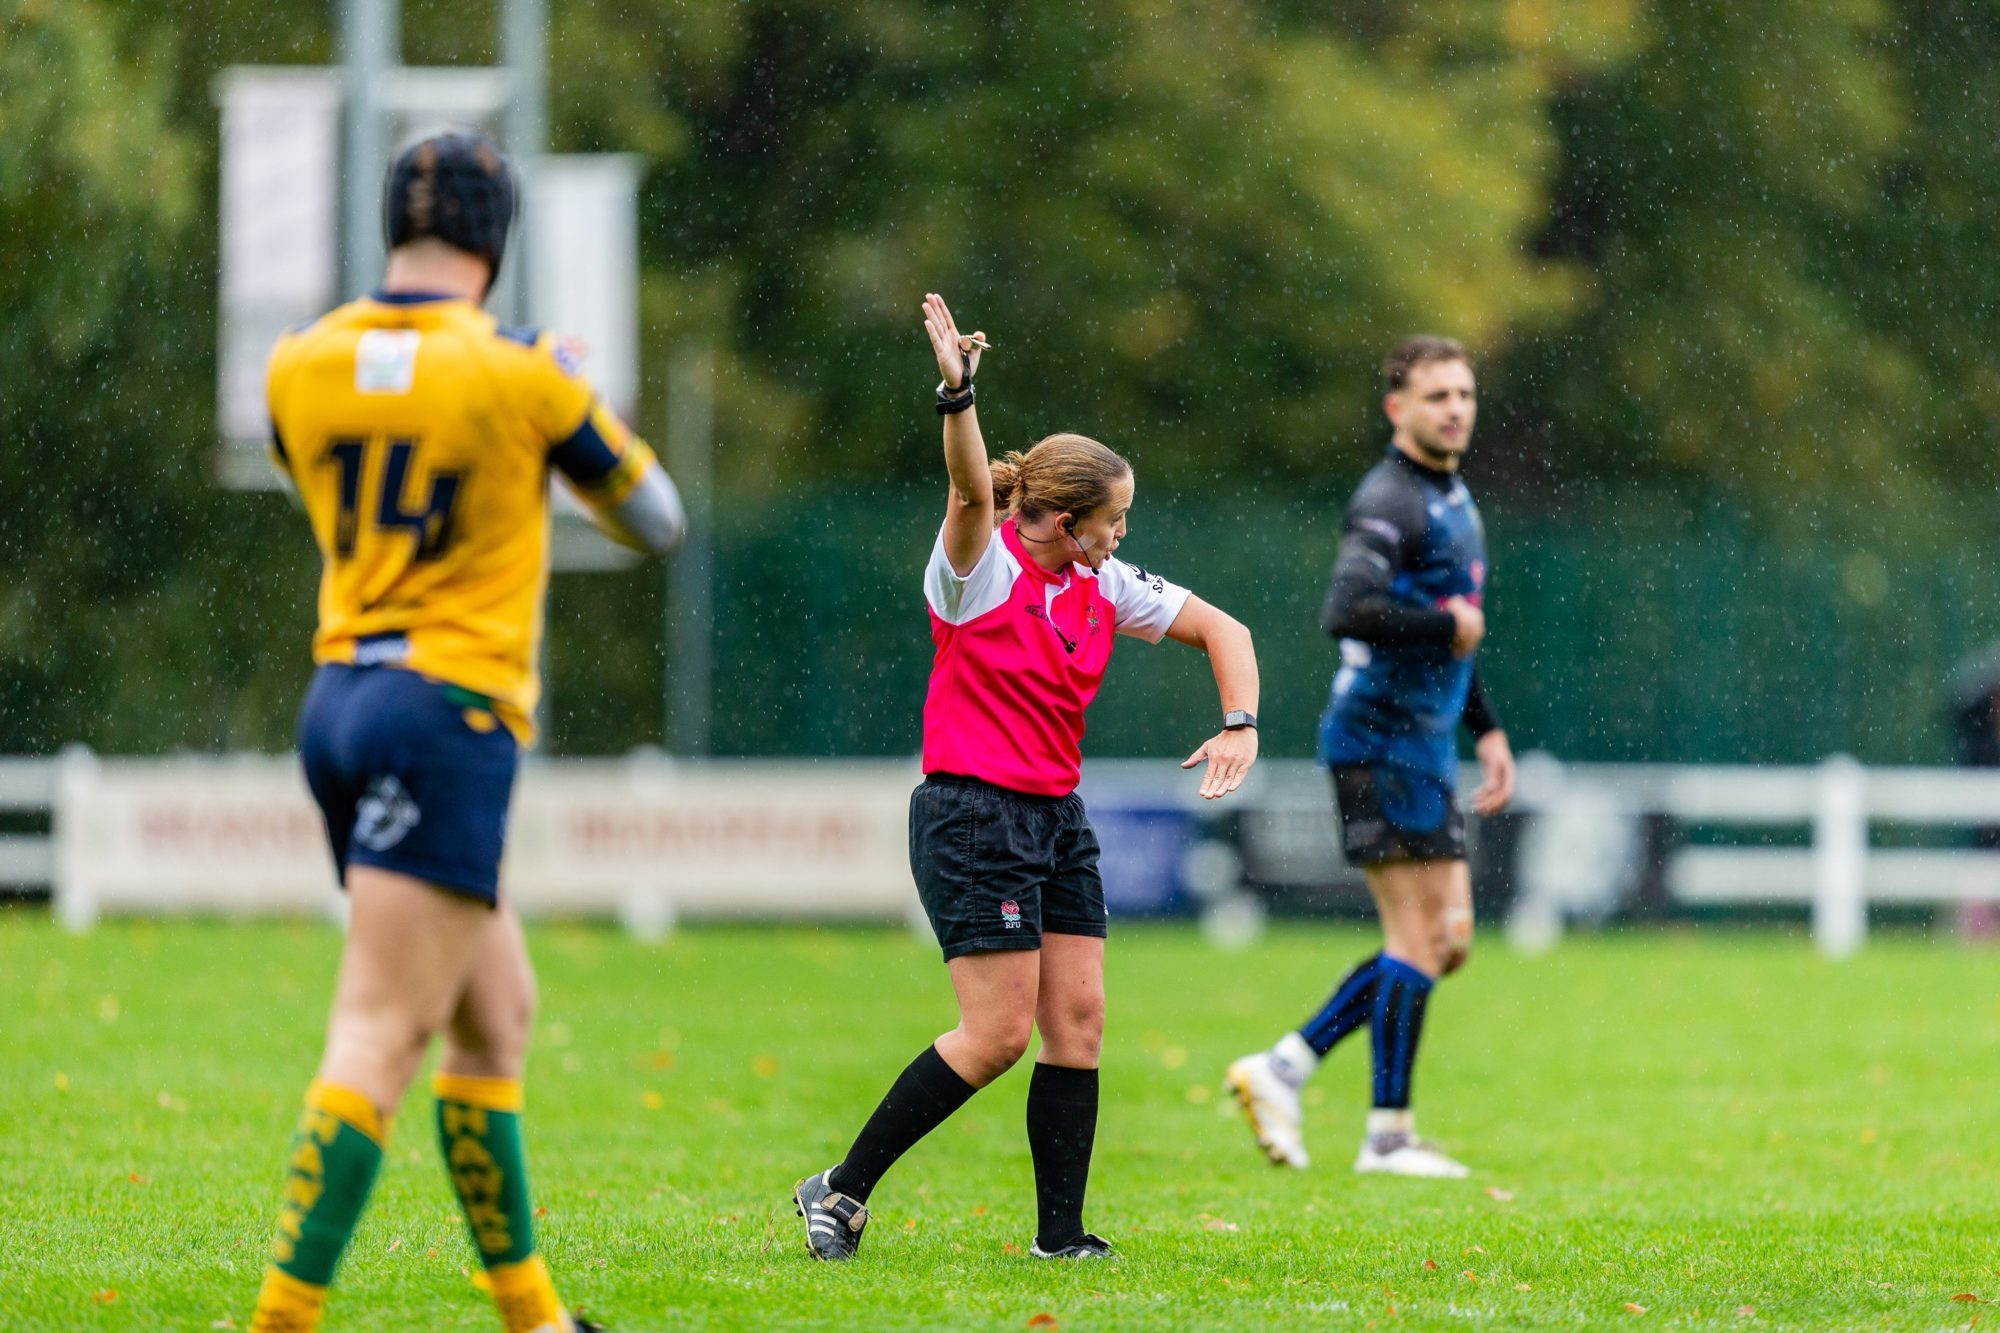 ARU Referee Nikki O'Donnell First Senior International Fixture